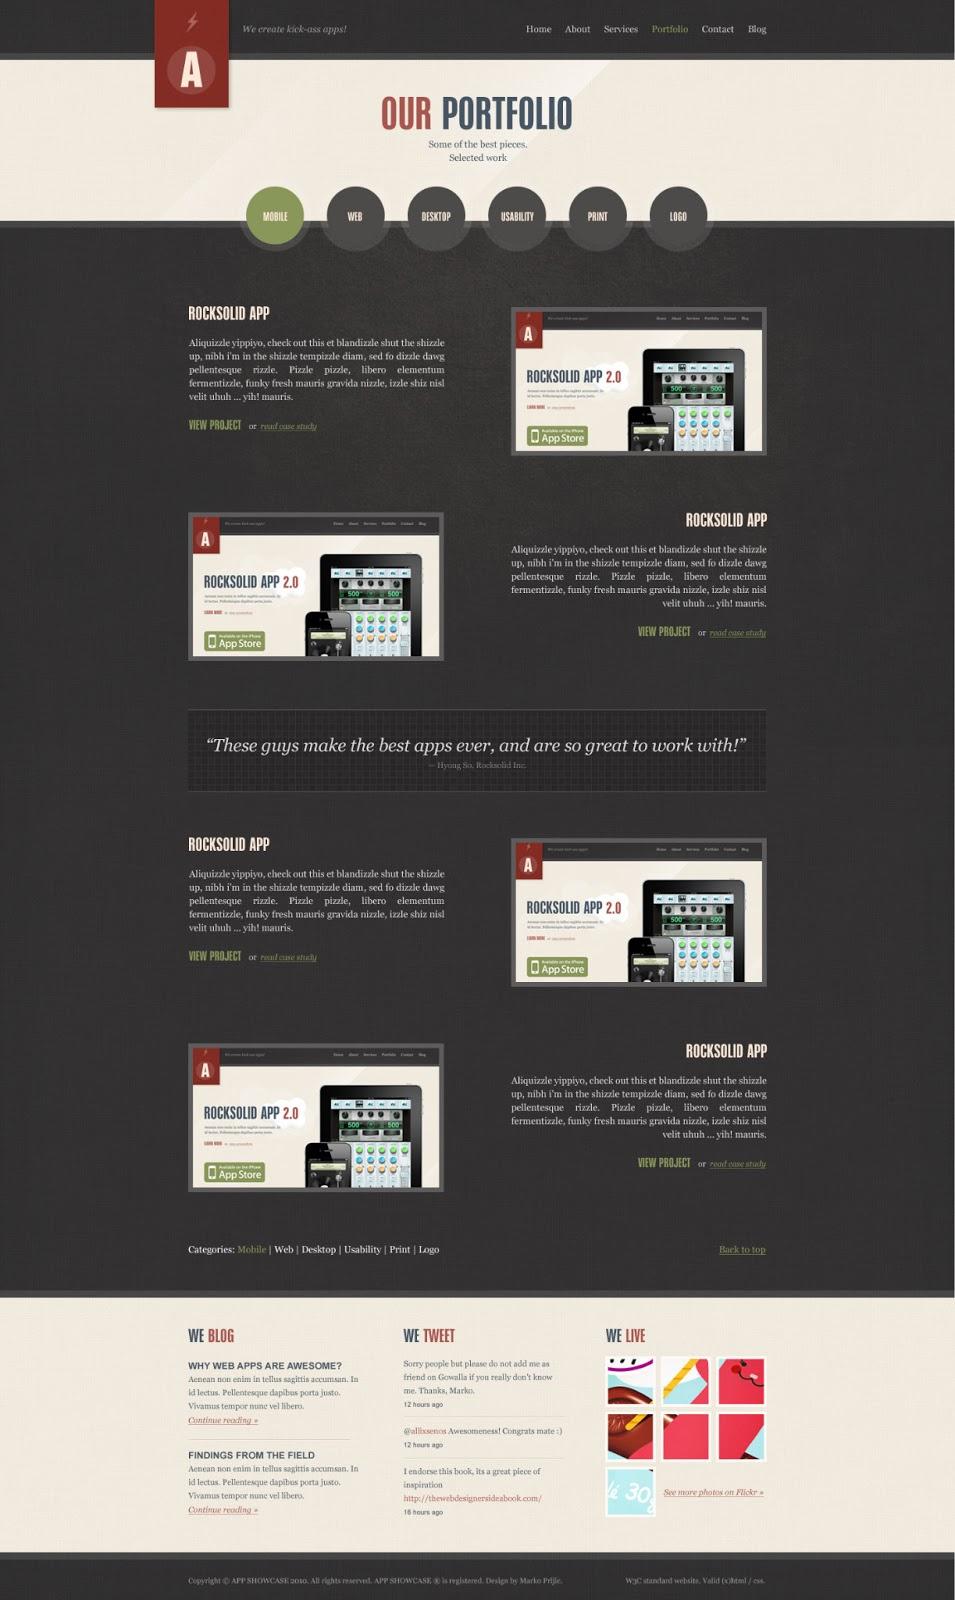 Rocksolid-App-Agency-Premium-Templates